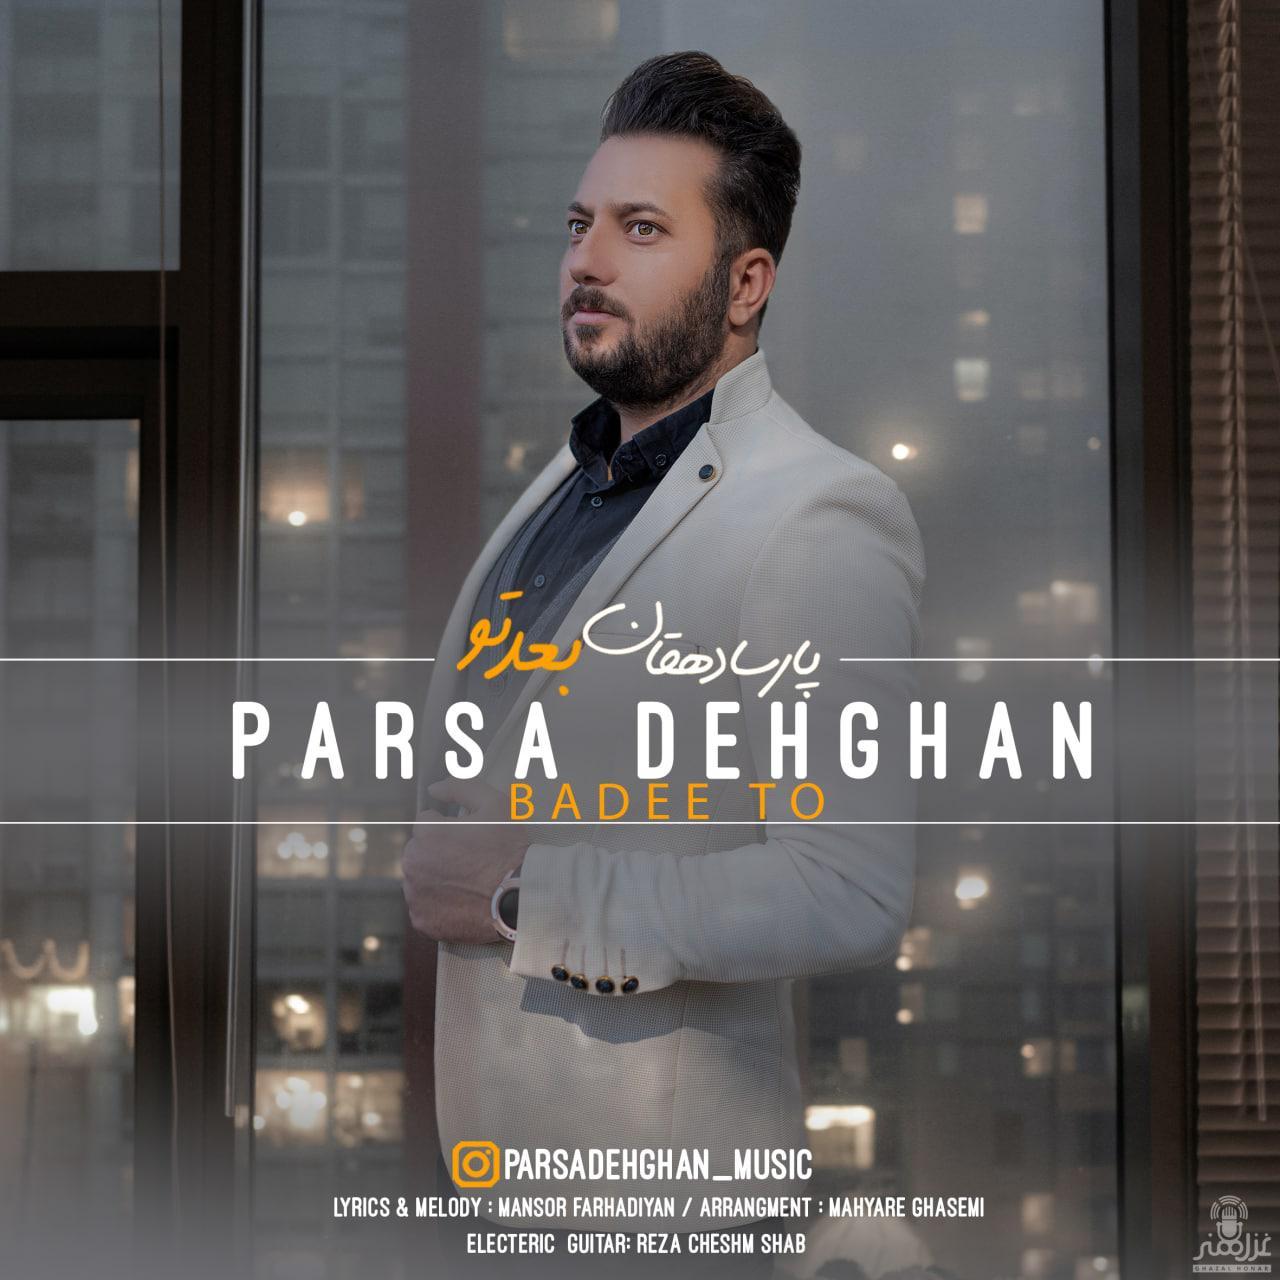 Parsa Dehghan – Badee To